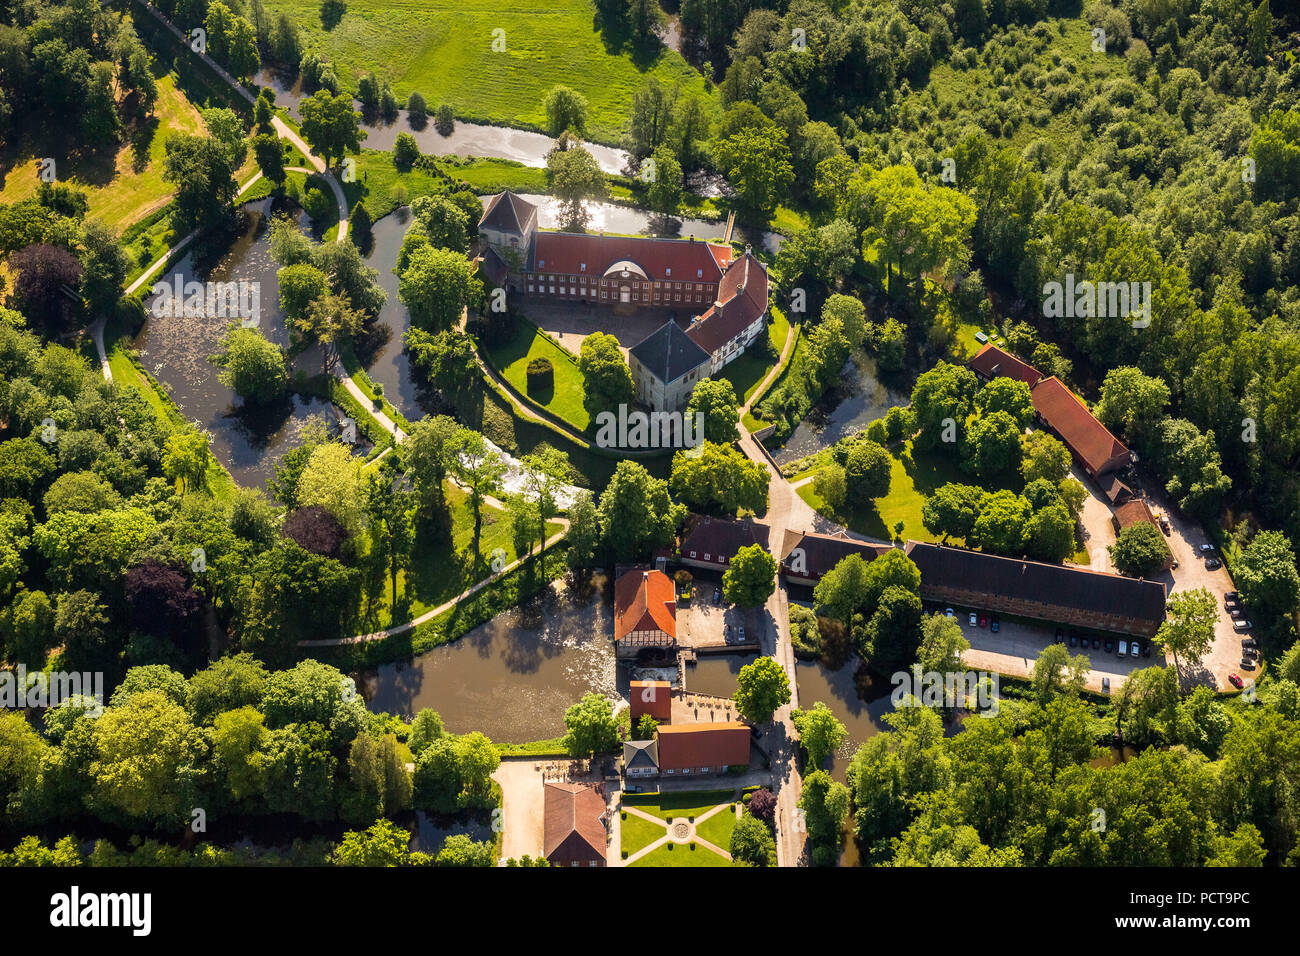 https www alamy com view of the rheda castle moated castle with trees rheda wiedenbrck east westphalia north rhine westphalia germany image214434820 html